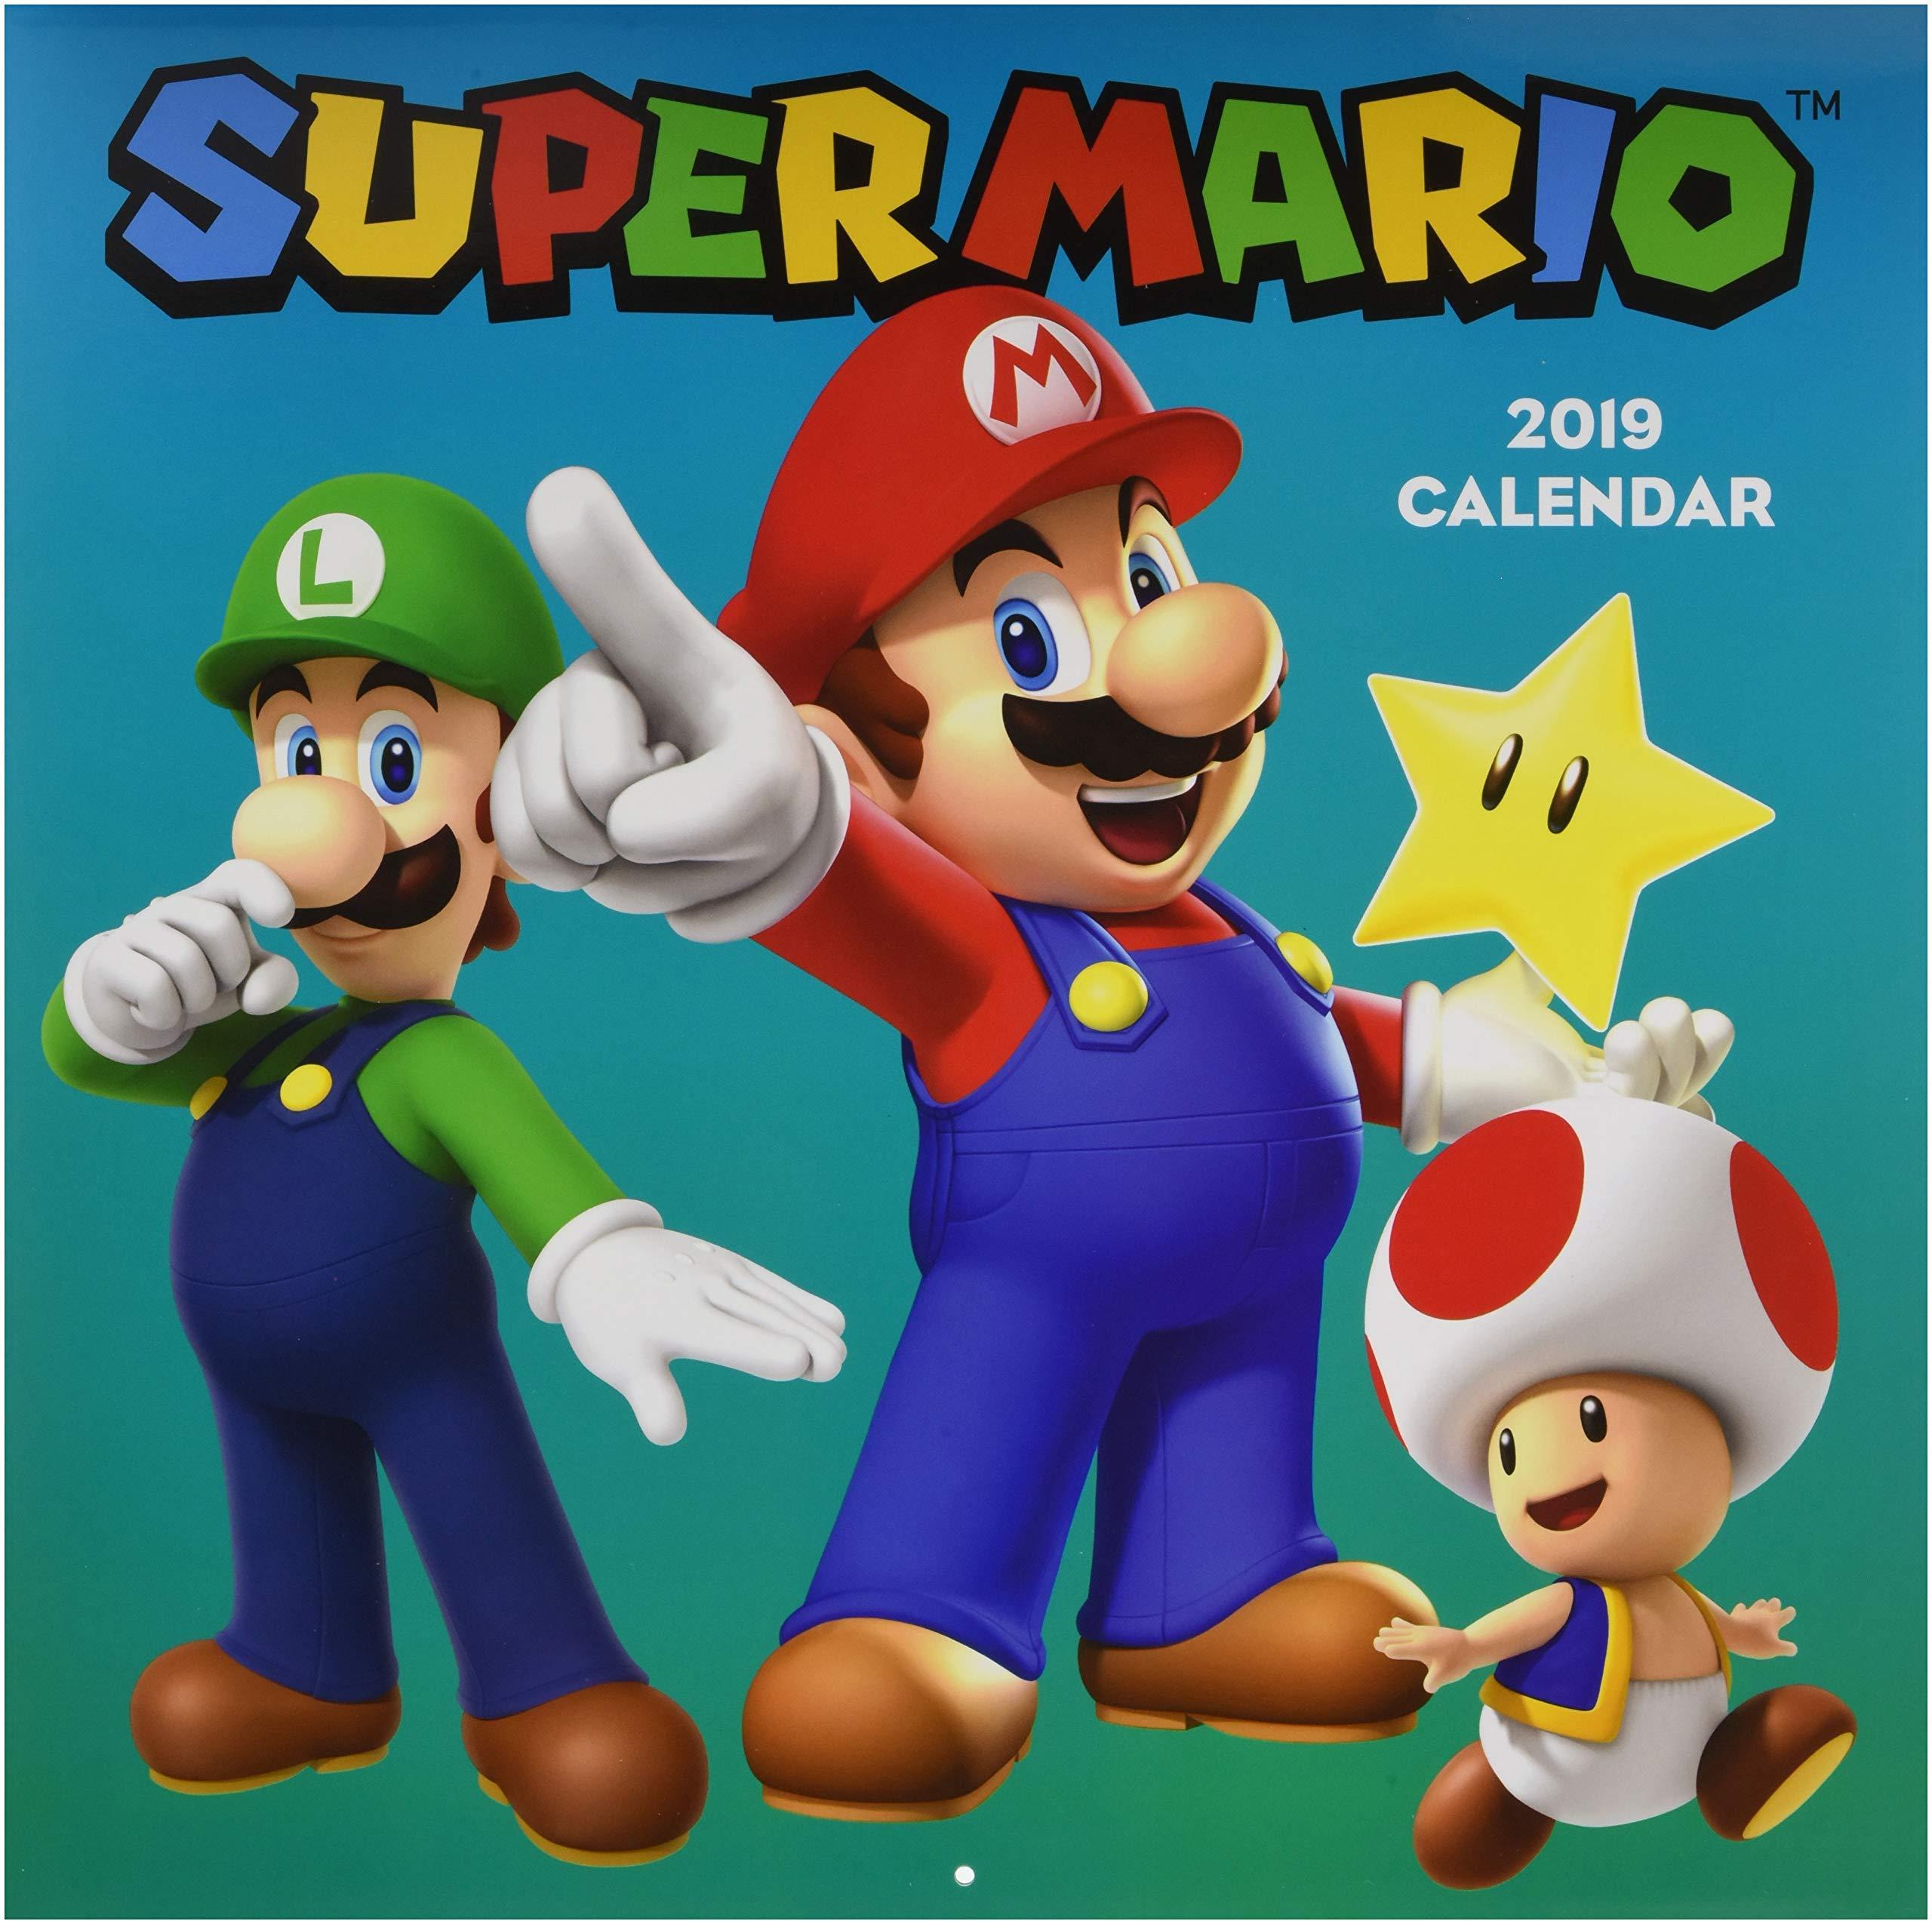 2019 Wall Calendar, Super Mario: Amazon.es: Pokemon: Libros en idiomas extranjeros